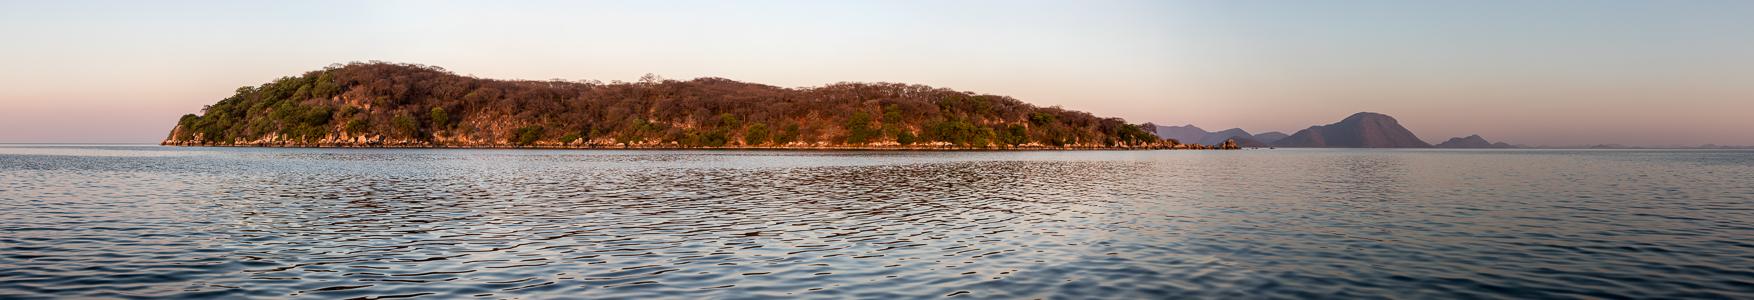 Lake Malawi National Park Malawisee, Mumbo Island